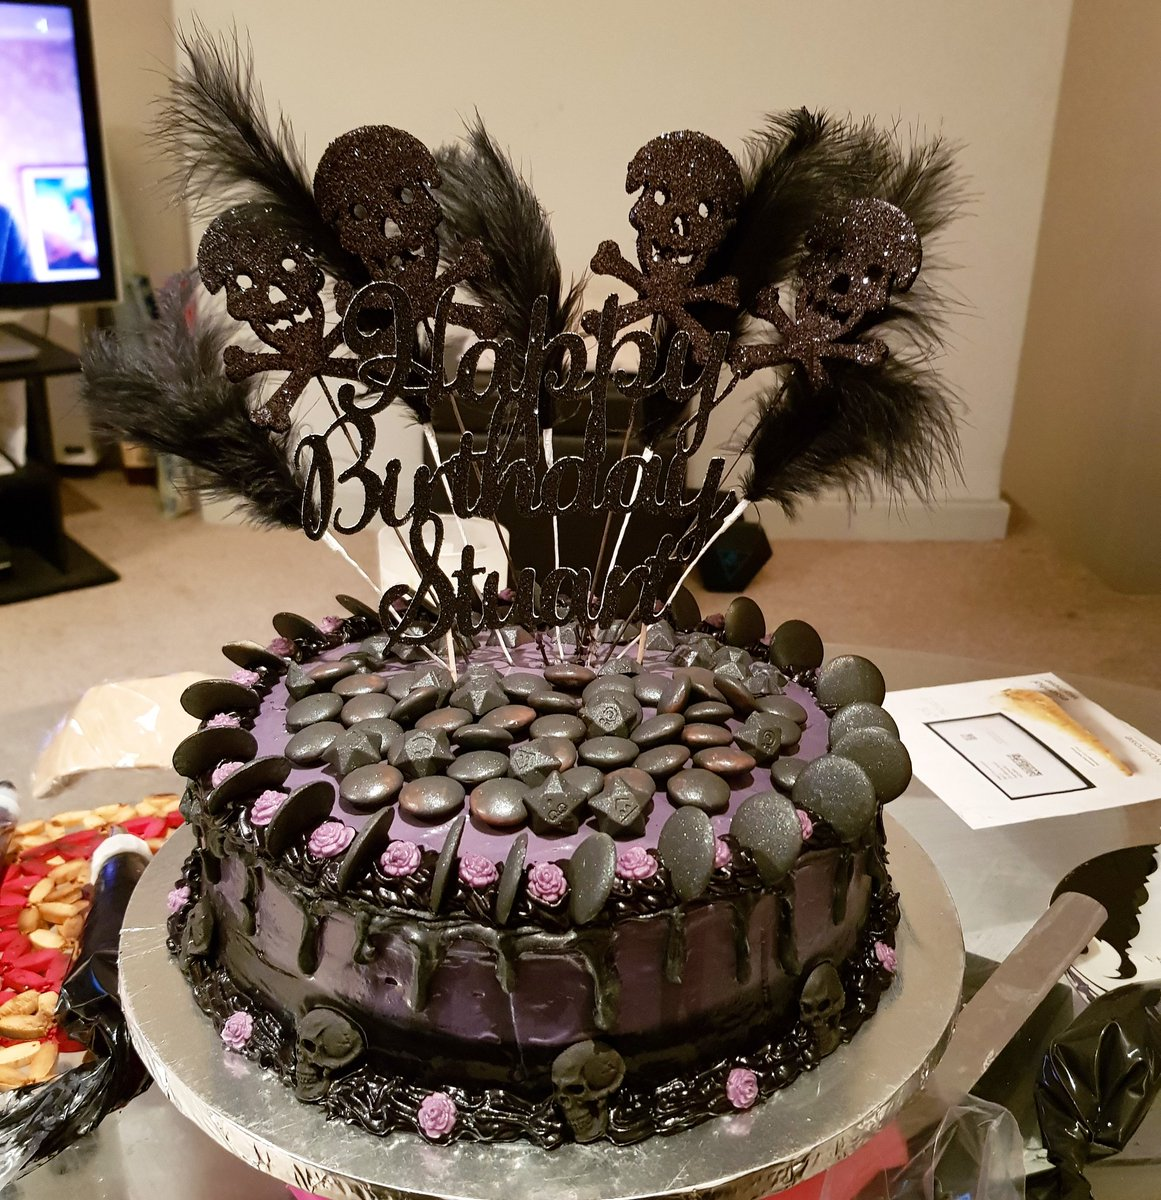 Sanjna Suryavanshi On Twitter Goth Birthday Cake Made For My